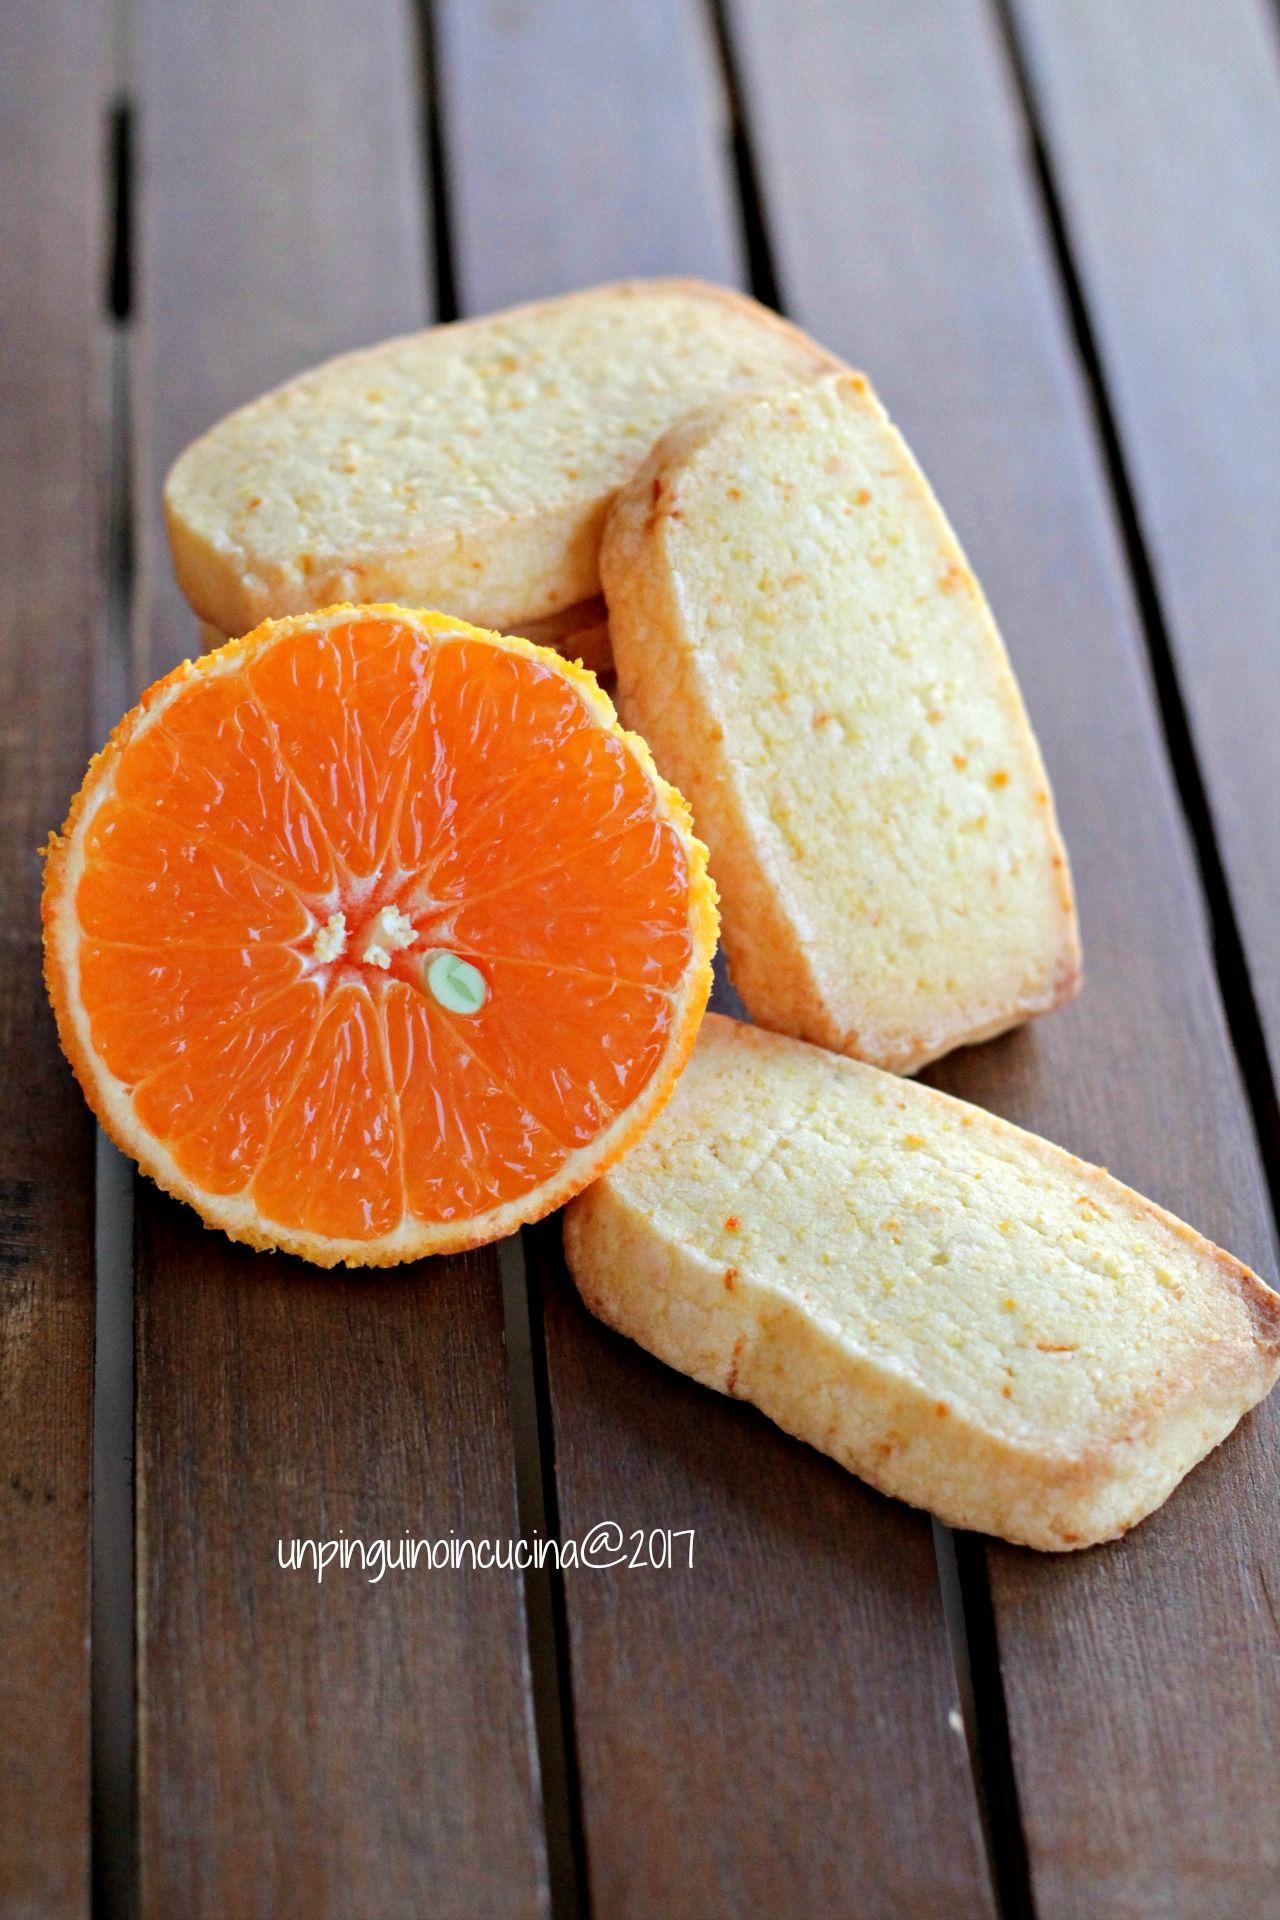 Clementine Cookies - Biscotti rustico alle clementine | Un Pinguino in Cucina